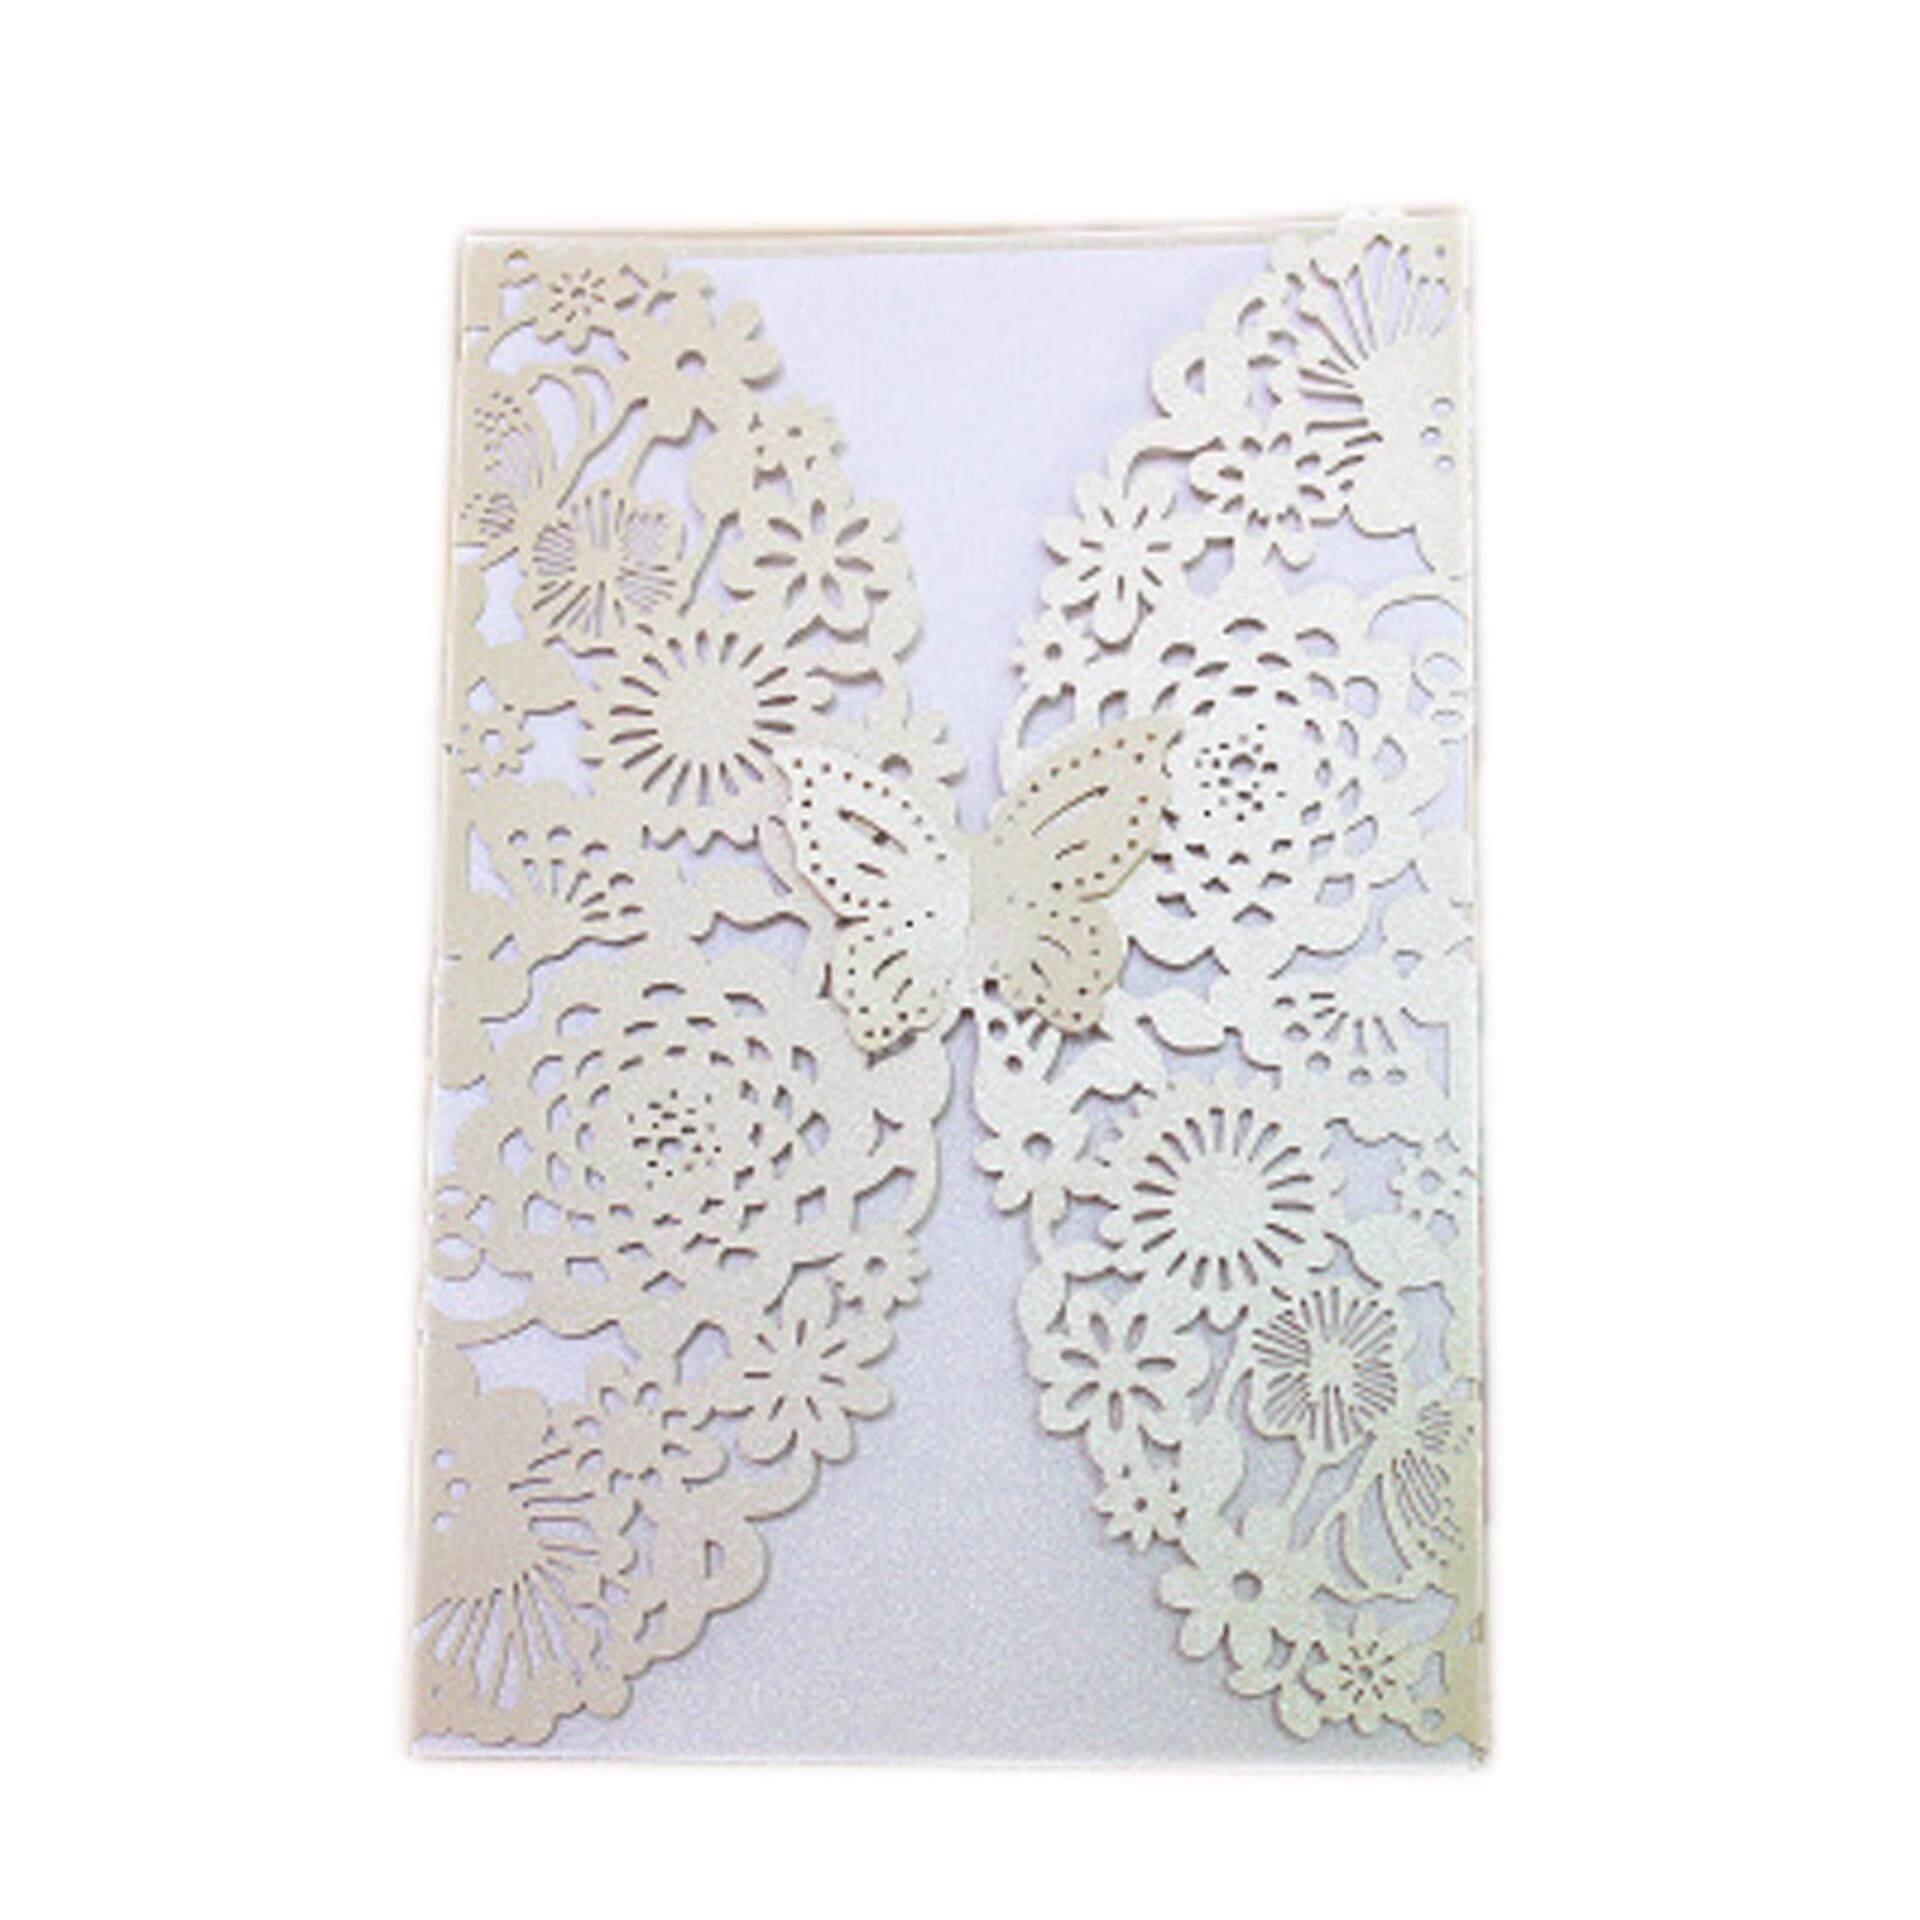 Hình ảnh Fancyqube 2Pcs Delicate Carved Butterflies Romantic Wedding Party Invitation Card H04 - intl